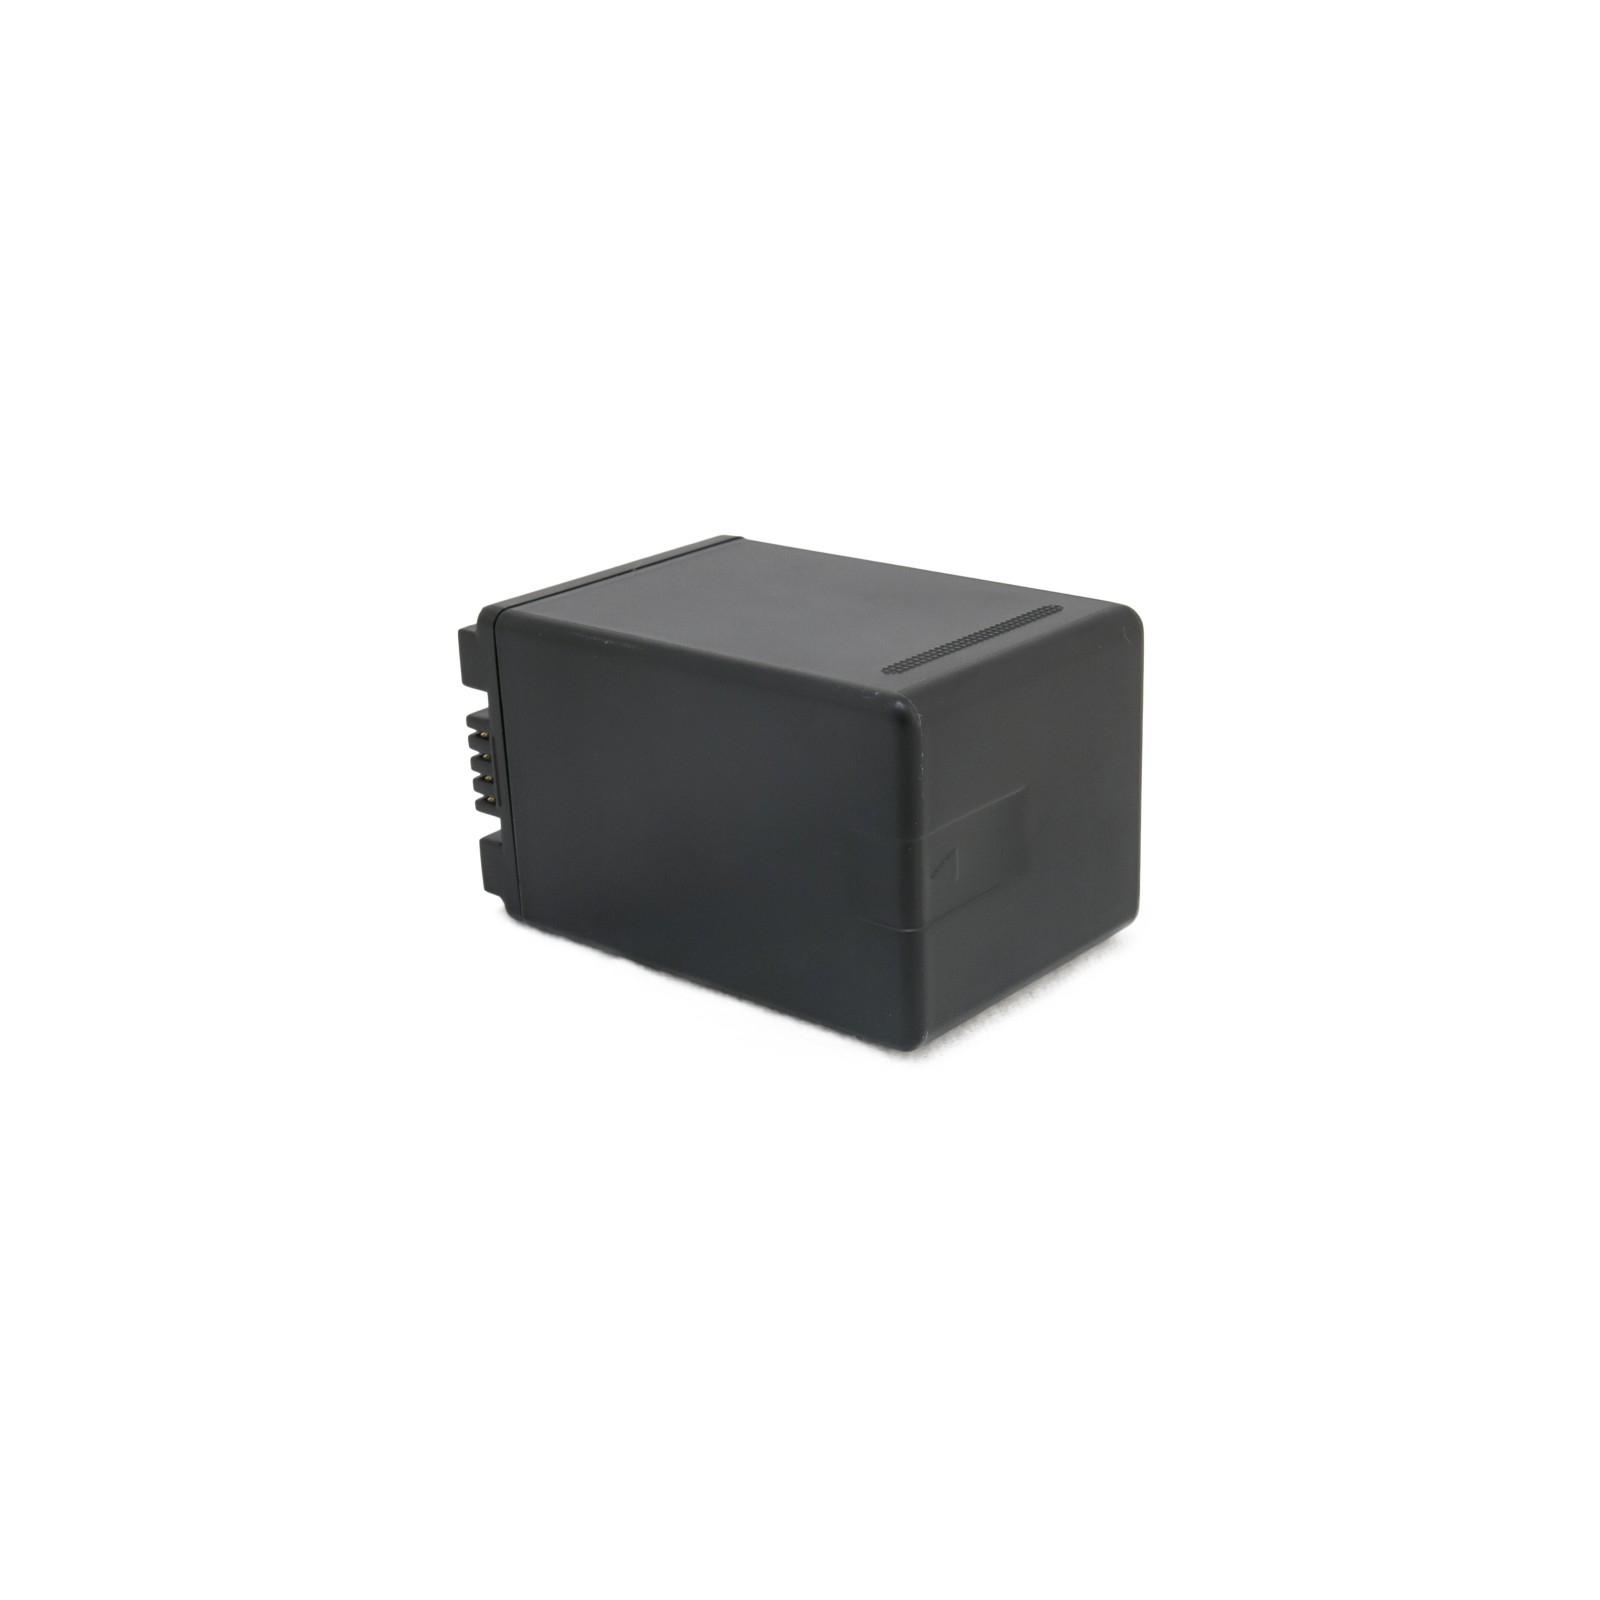 Аккумулятор к фото/видео EXTRADIGITAL Panasonic VW-VBN390 (DV00DV1365) изображение 3